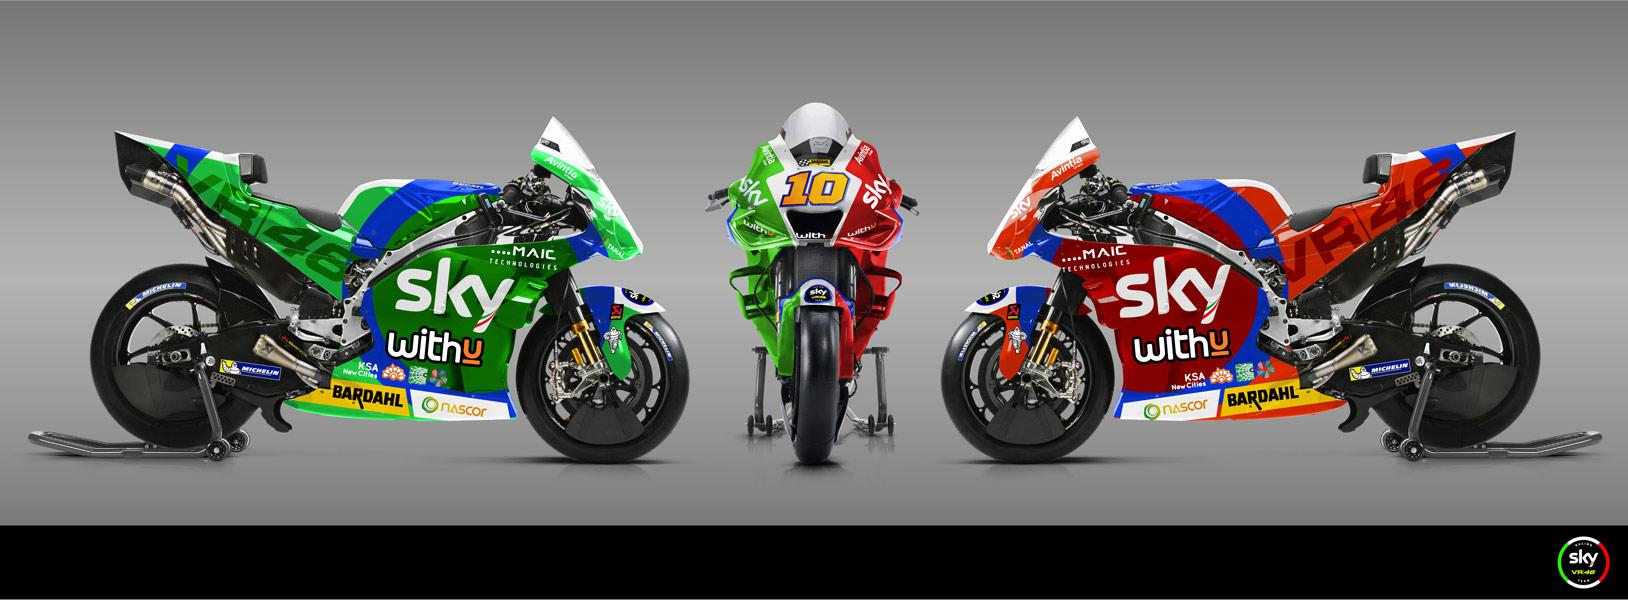 Motogp Photo A Tricoloured Ducati For Luca Marini At Mugello Gpone Com